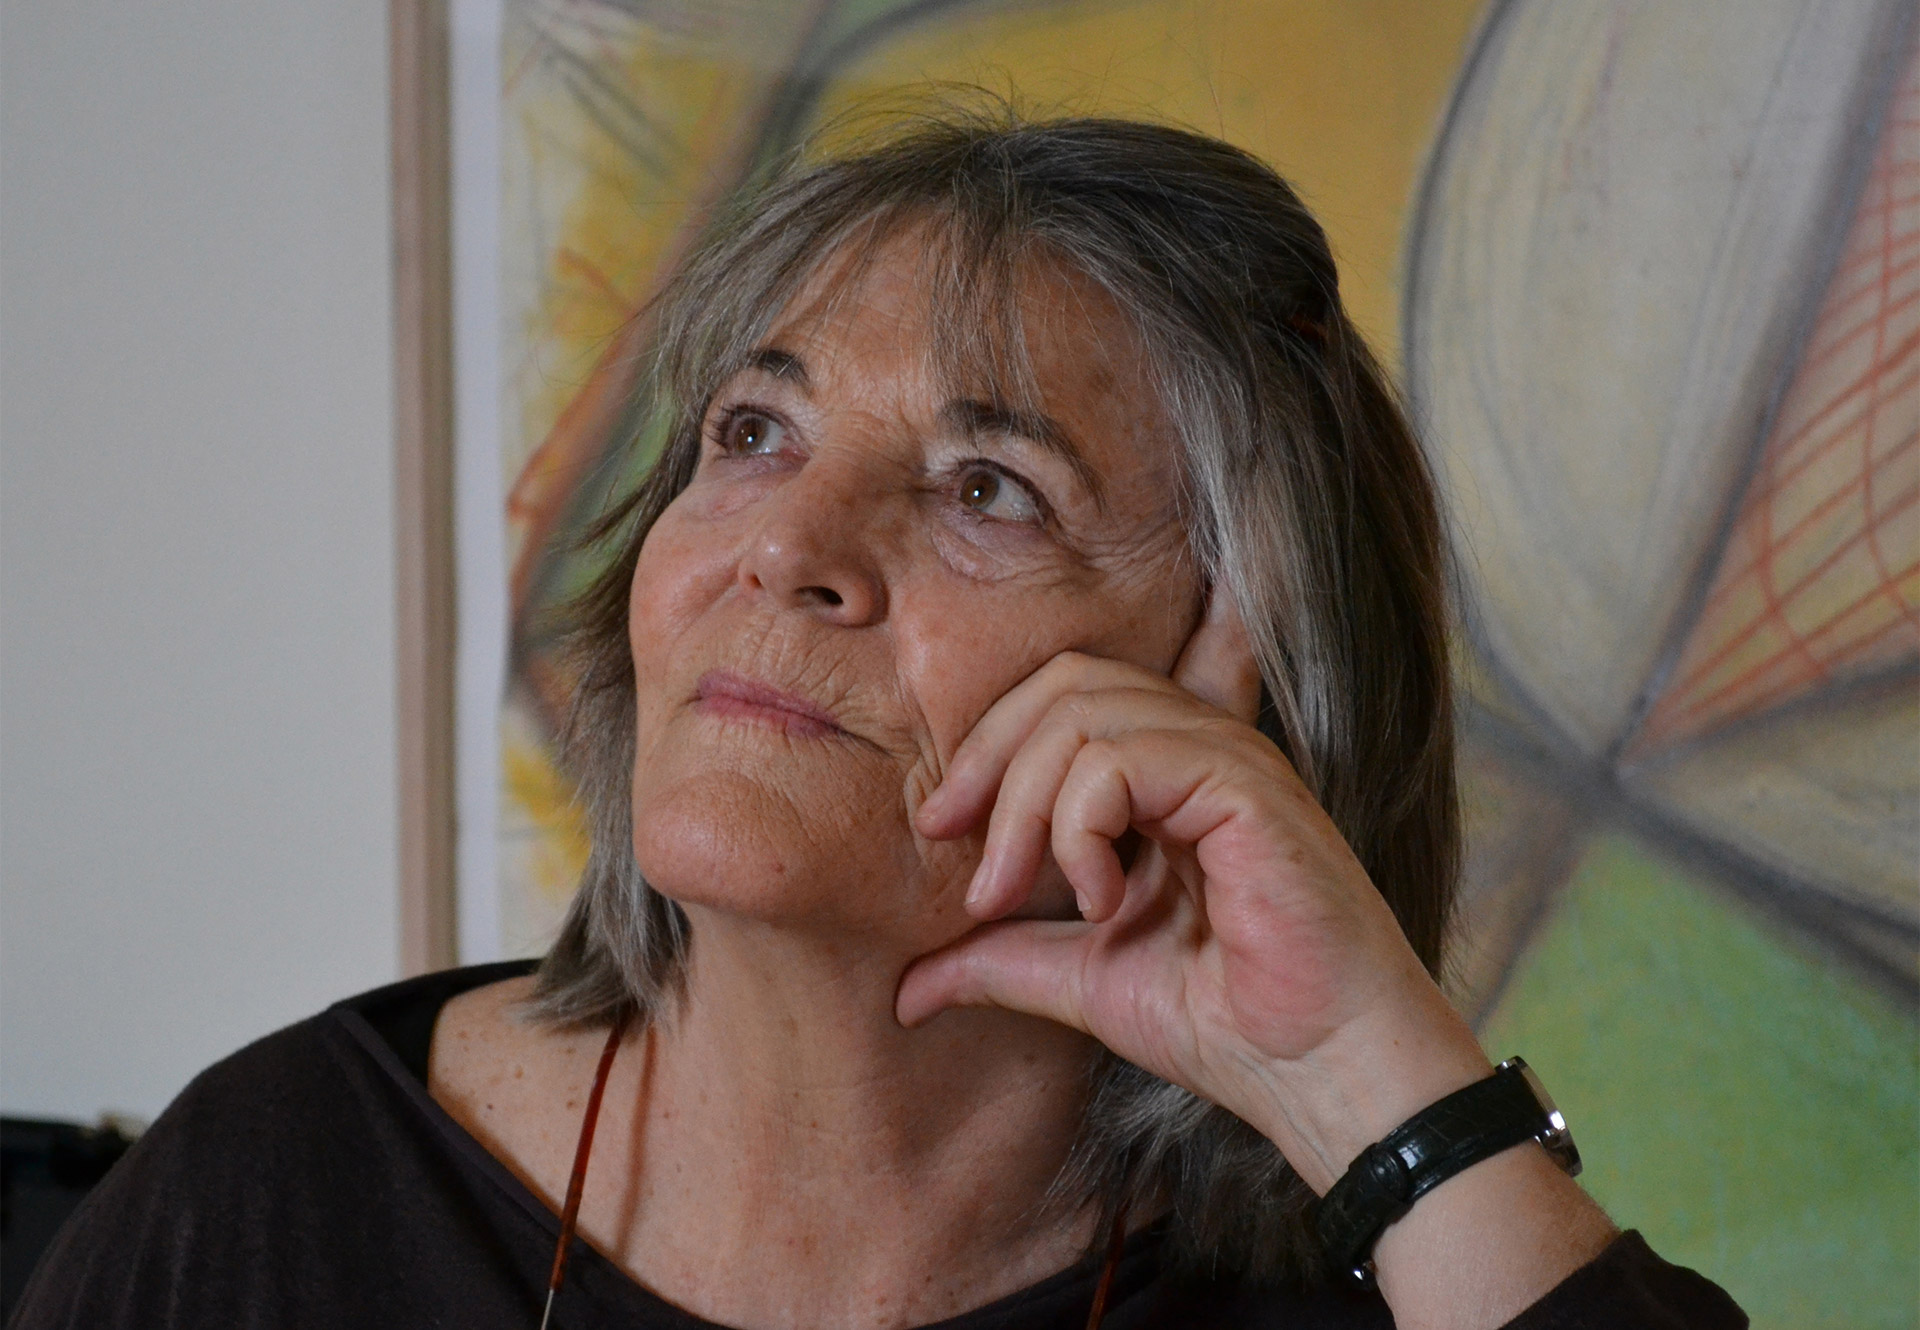 Susana Solano | Artistas | Guggenheim Bilbao Museoa